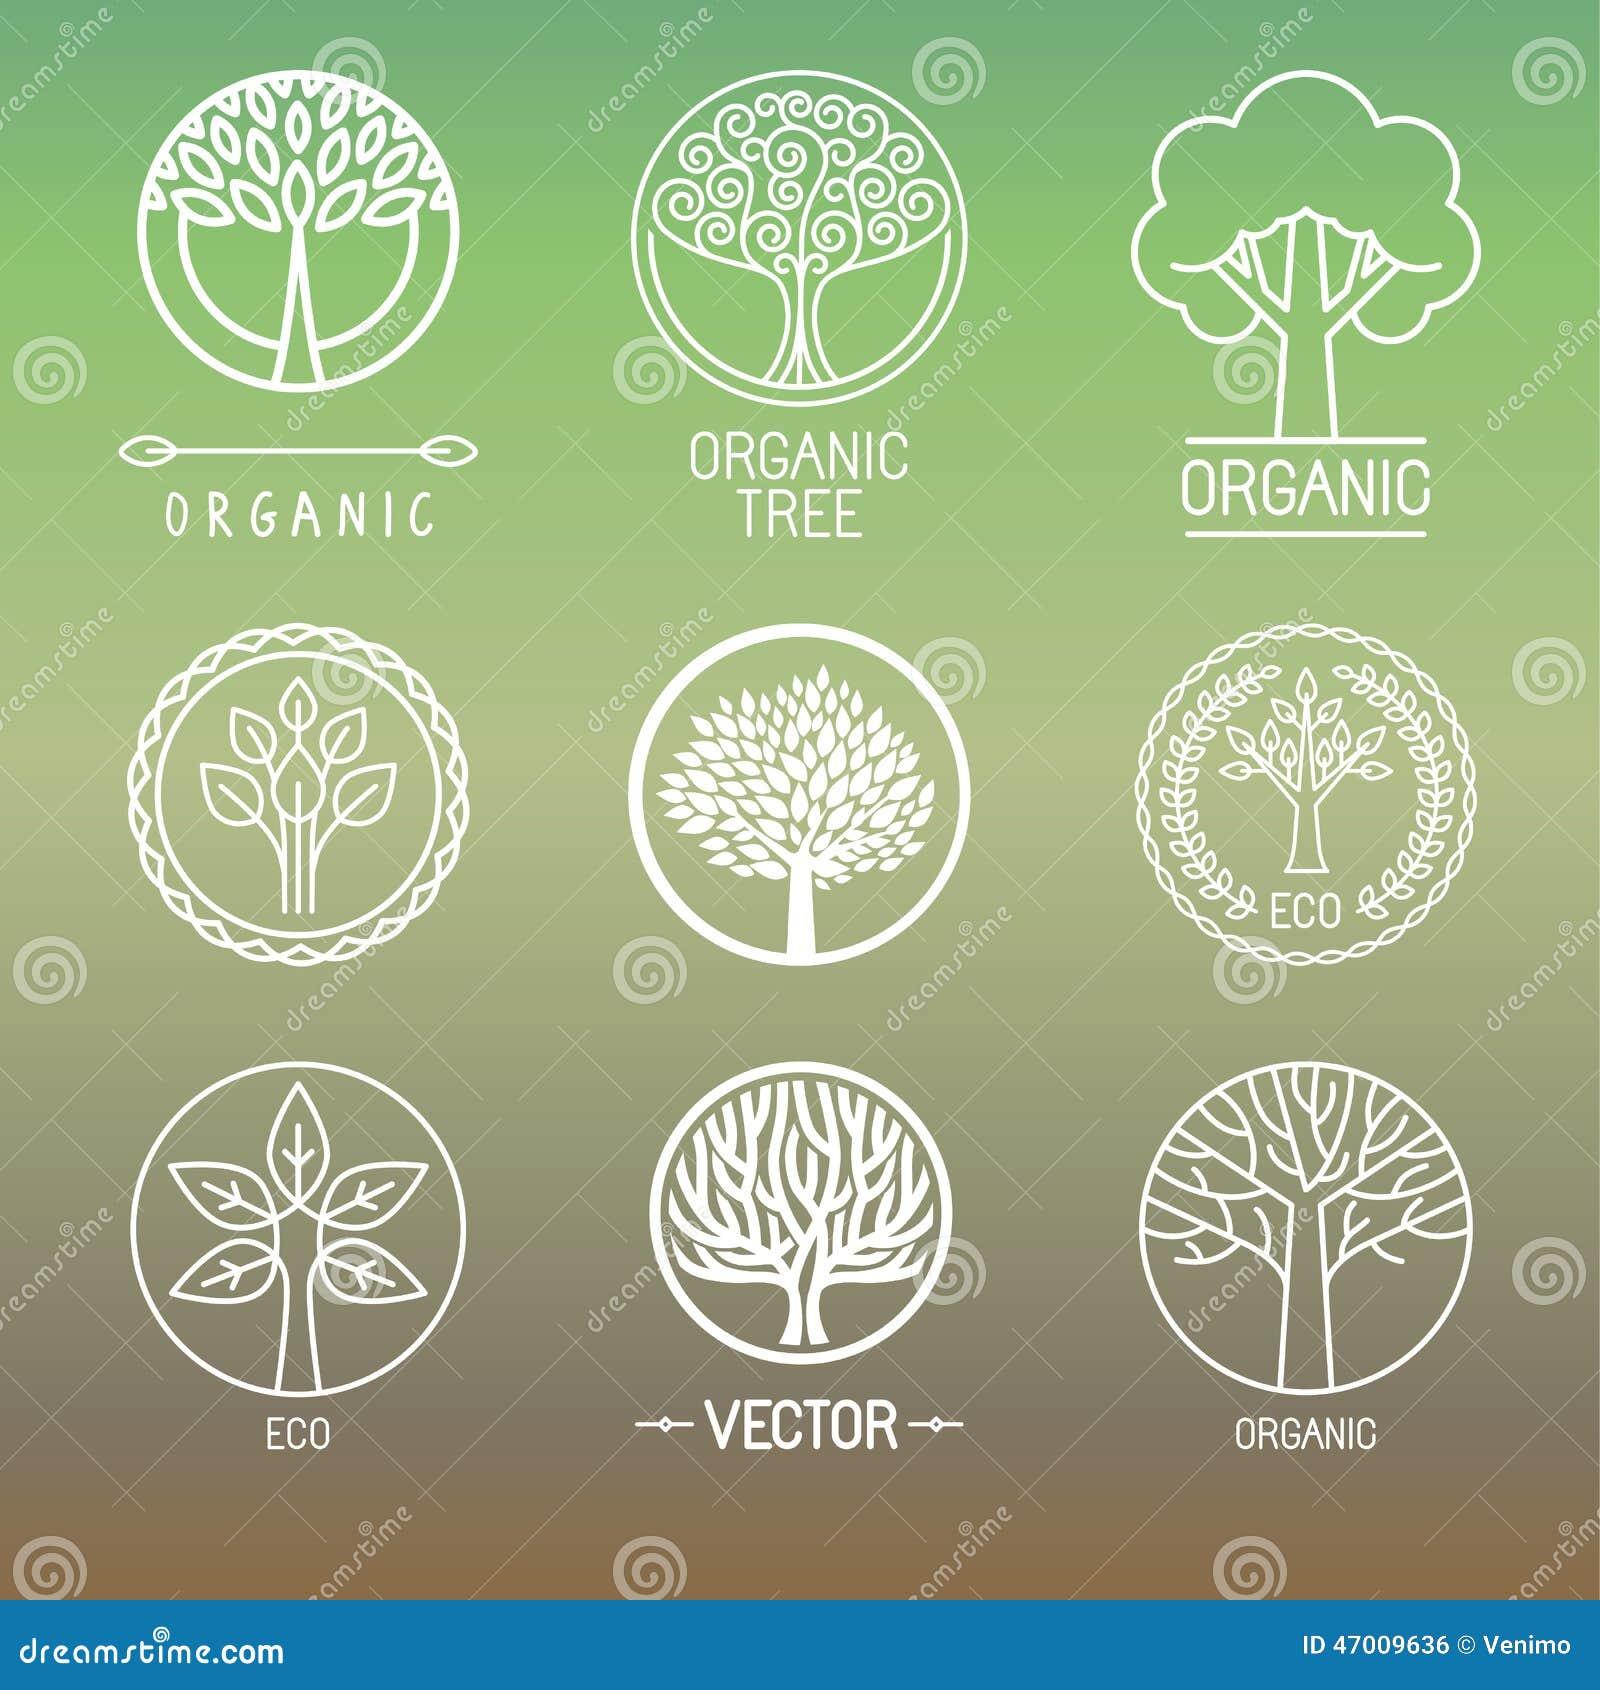 Vector tree logos and badges